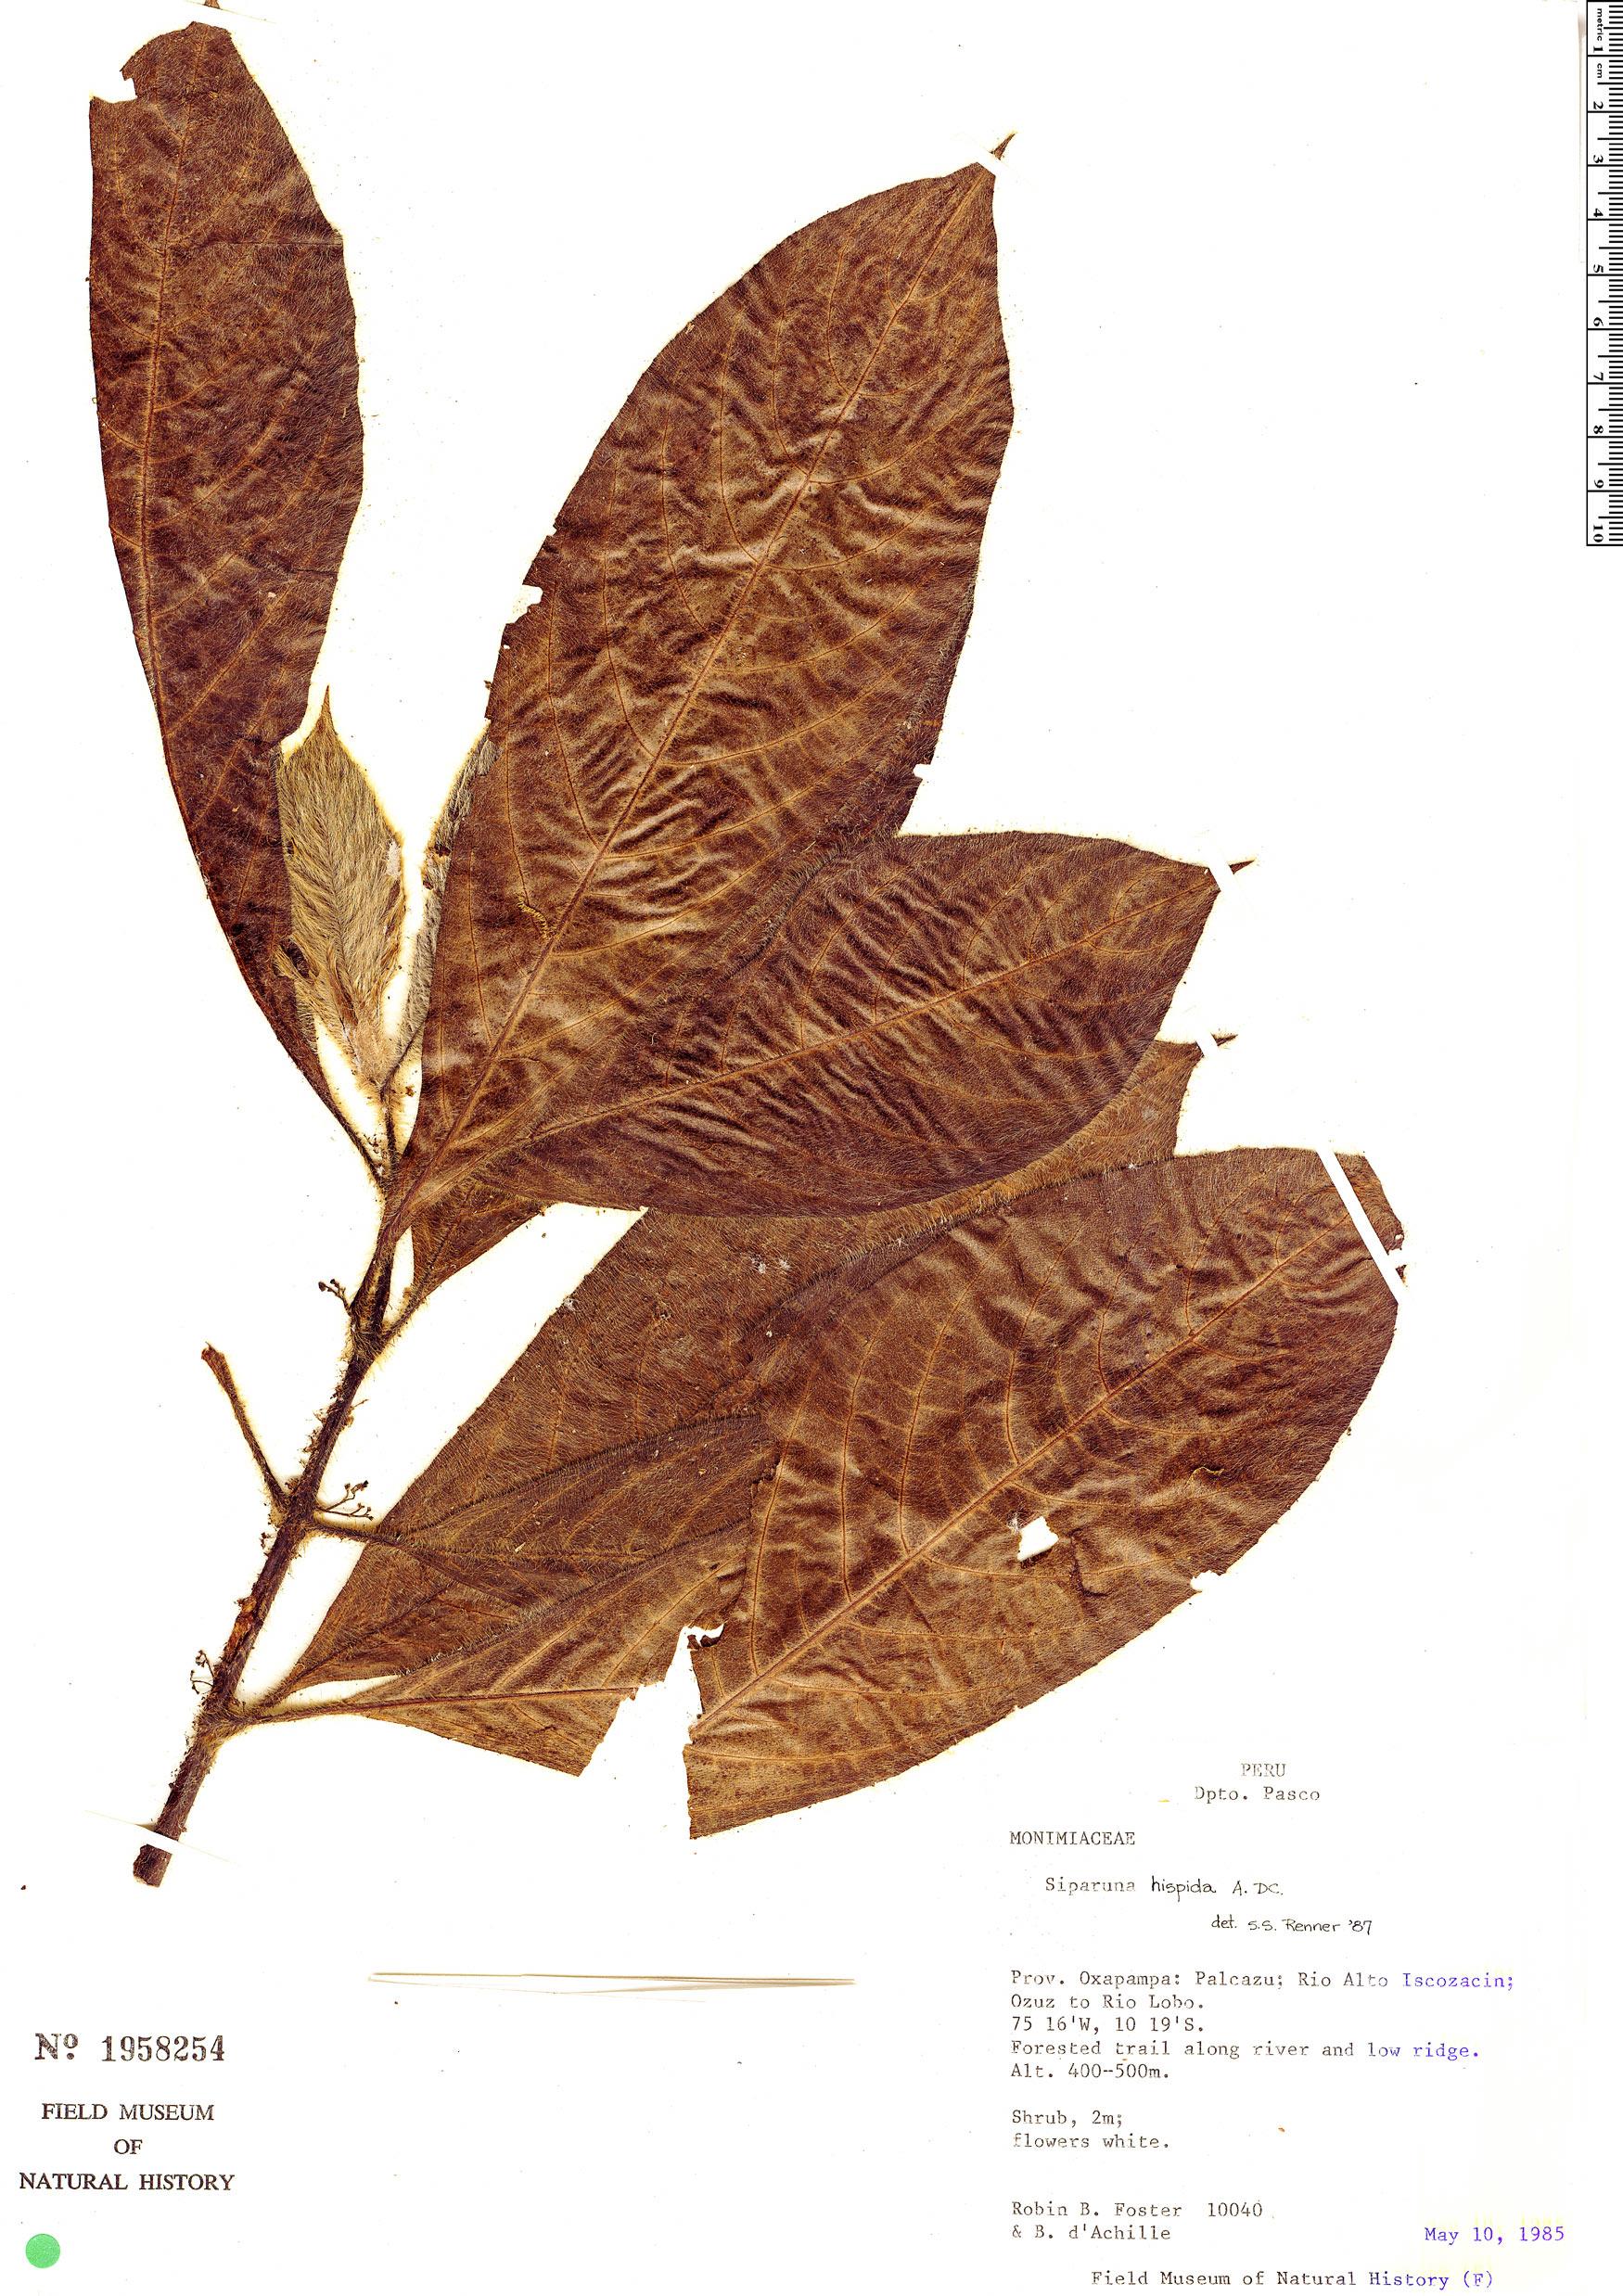 Specimen: Siparuna thecaphora